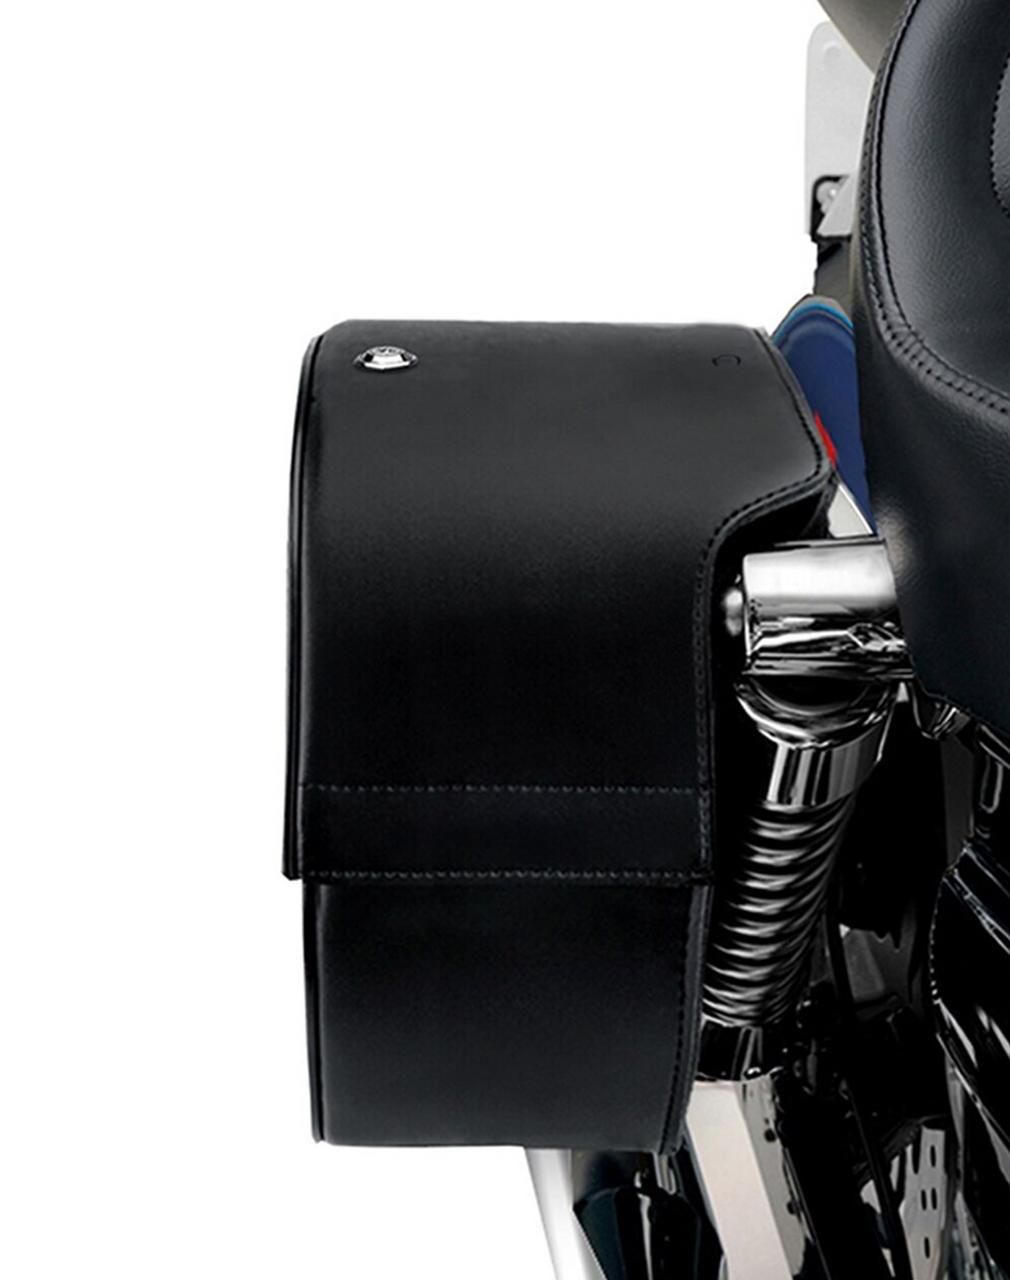 Honda VTX 1800 C Warrior Shock Cutout Slanted Large Motorcycle Saddlebags Shock Cutout View